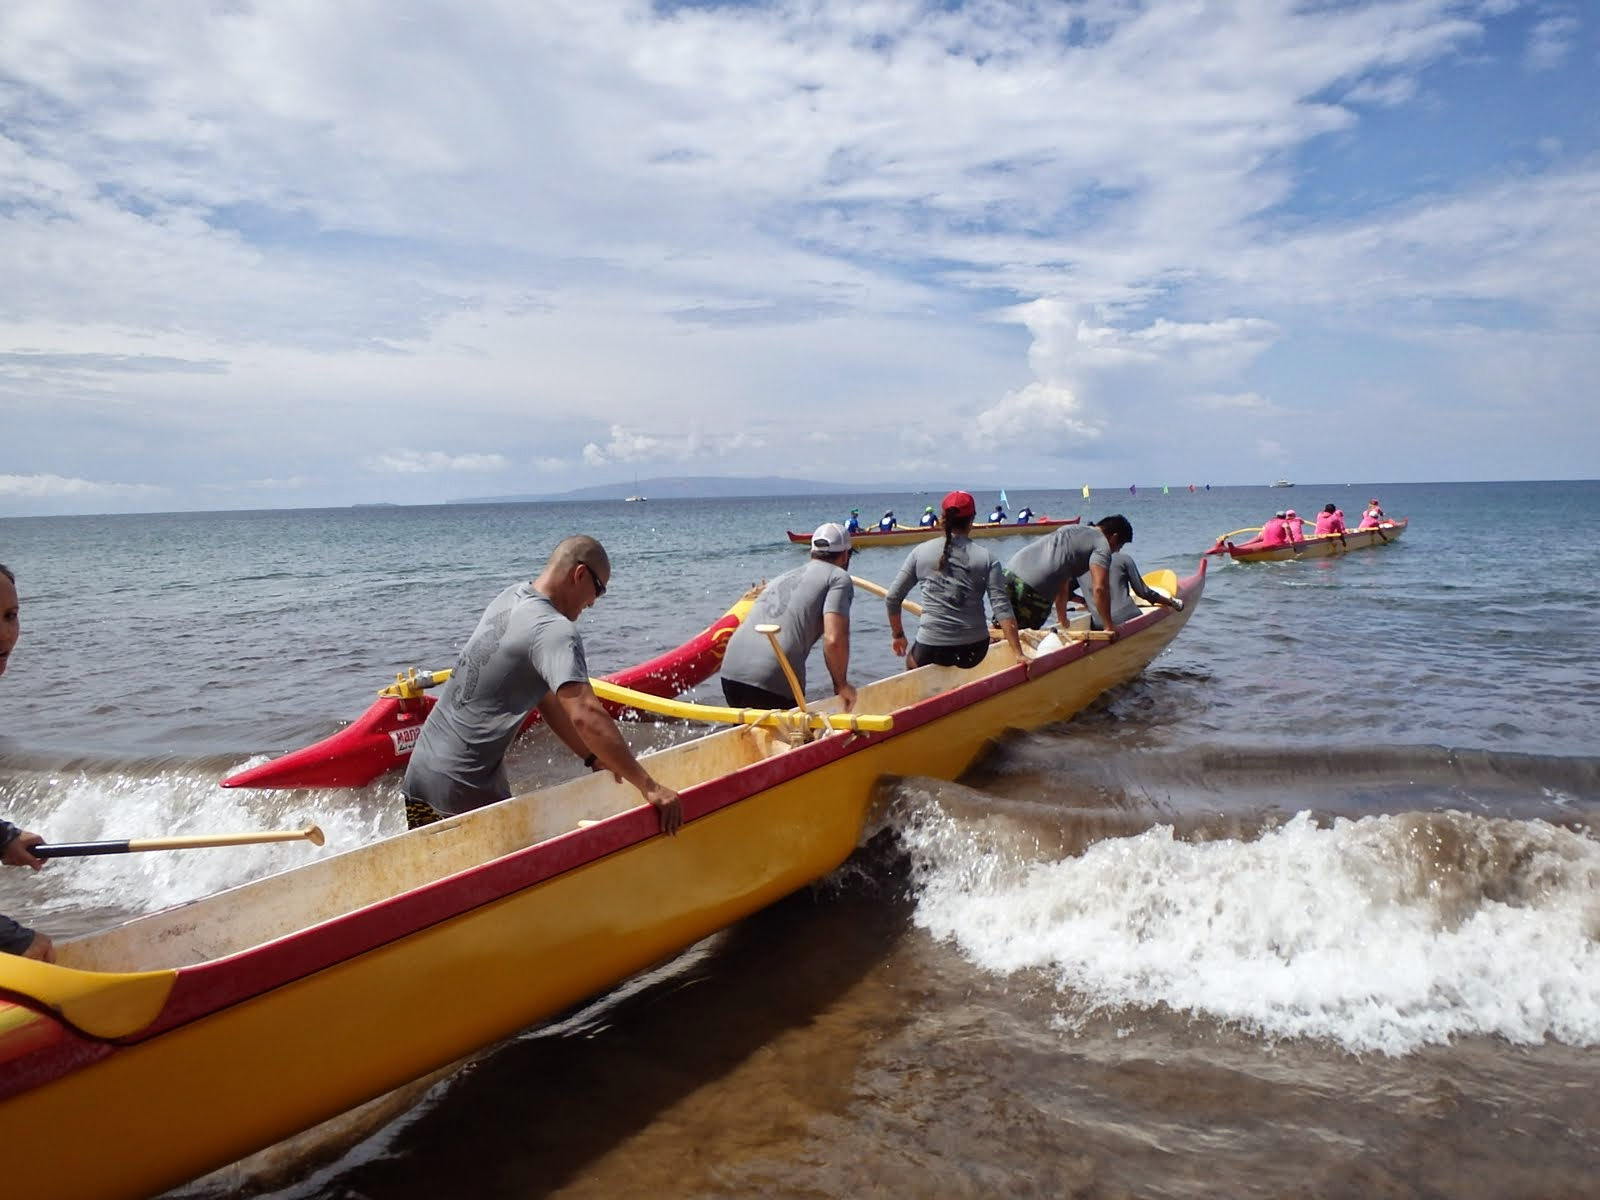 Beach canoe hawaii wallpaper 1600x1200